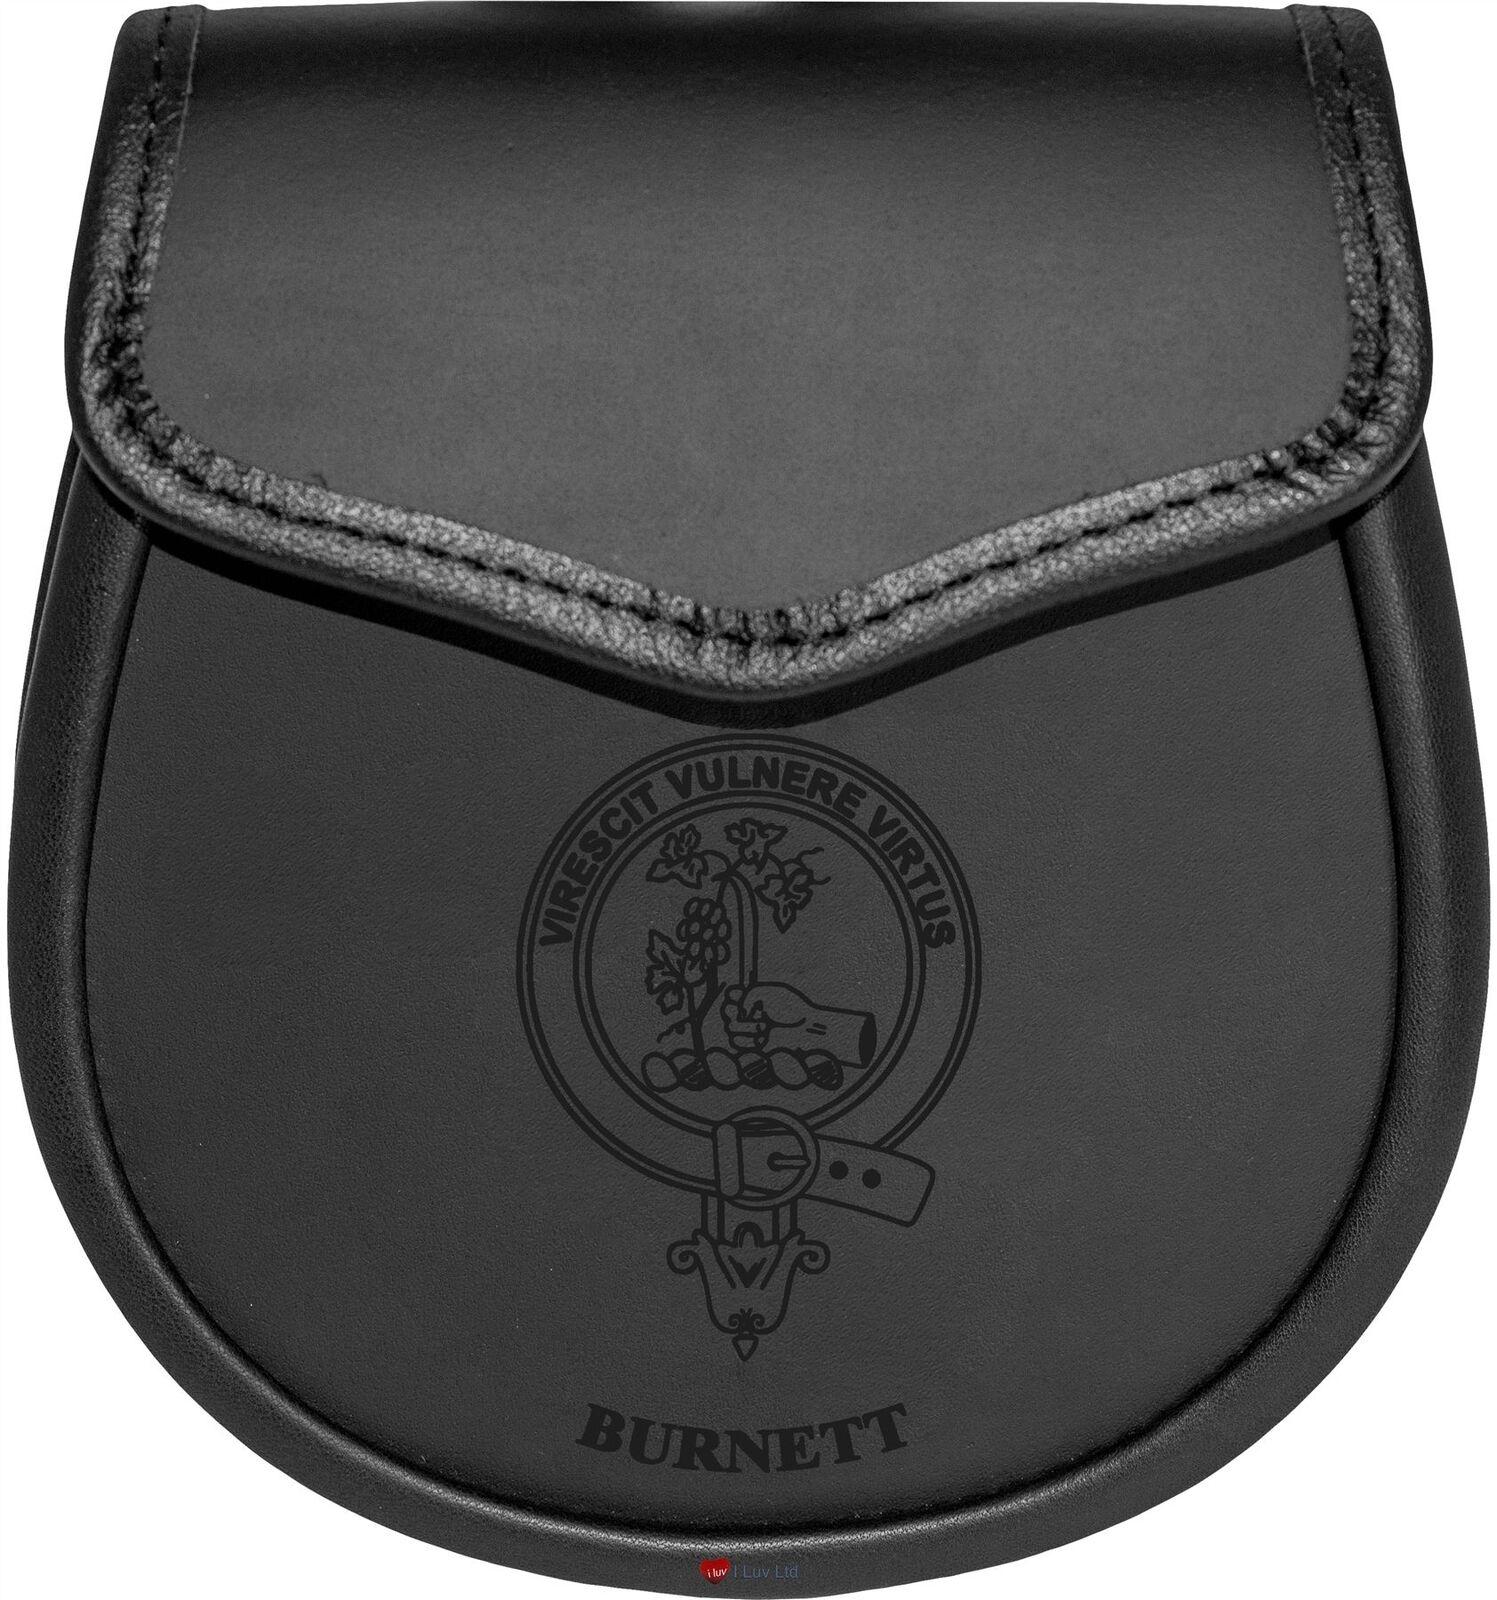 Burnett Leather Day Sporran Scottish Clan Crest